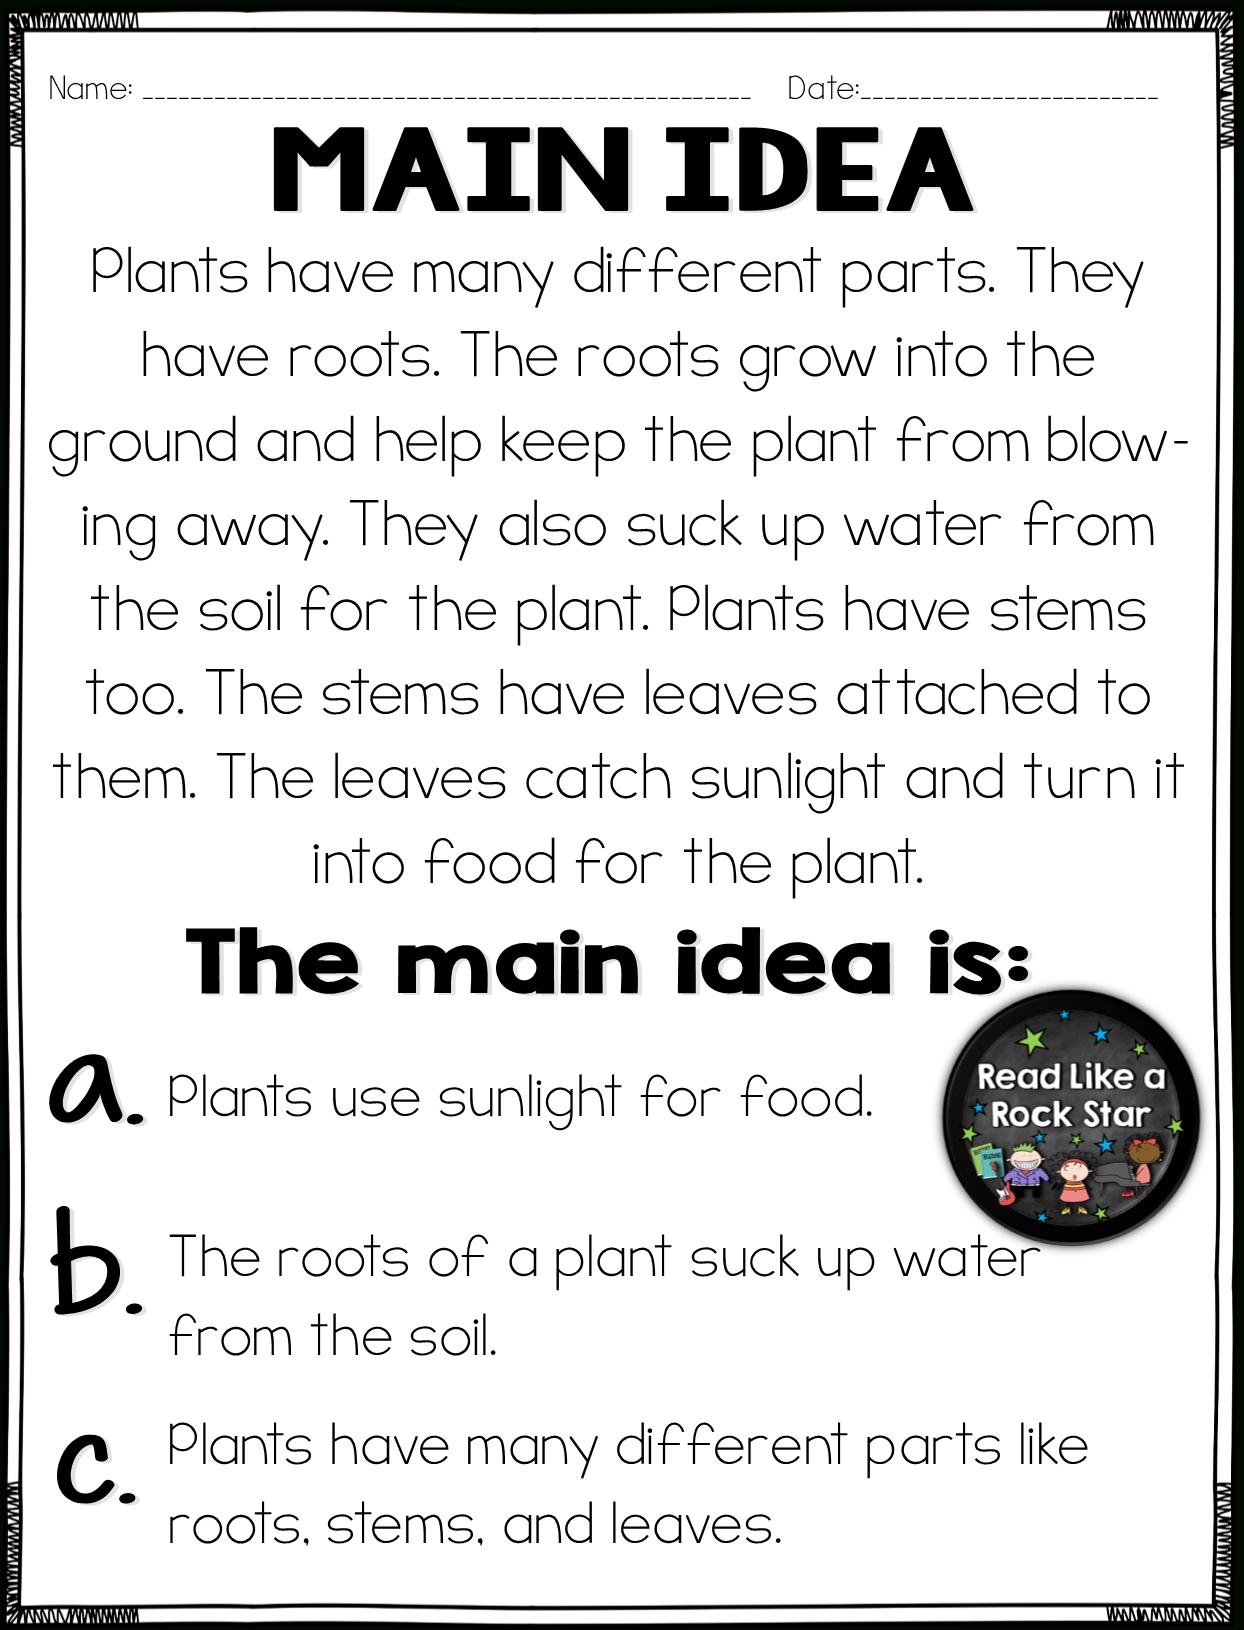 10 Most Popular Main Idea And Details First Grade main idea and details practice common core literacy main idea 2020